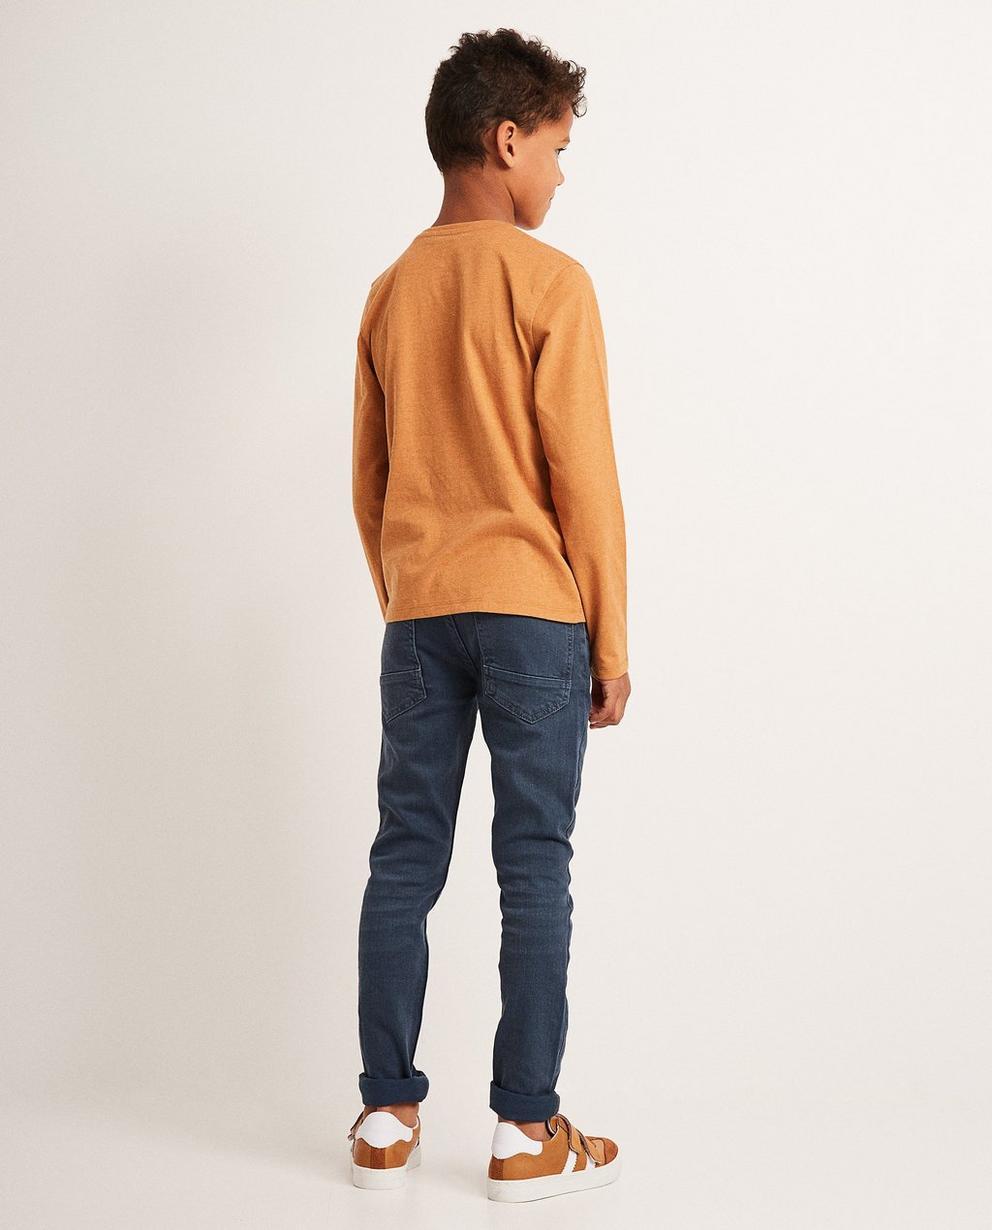 T-Shirts - Sand - Longsleeve mit Aufnähern